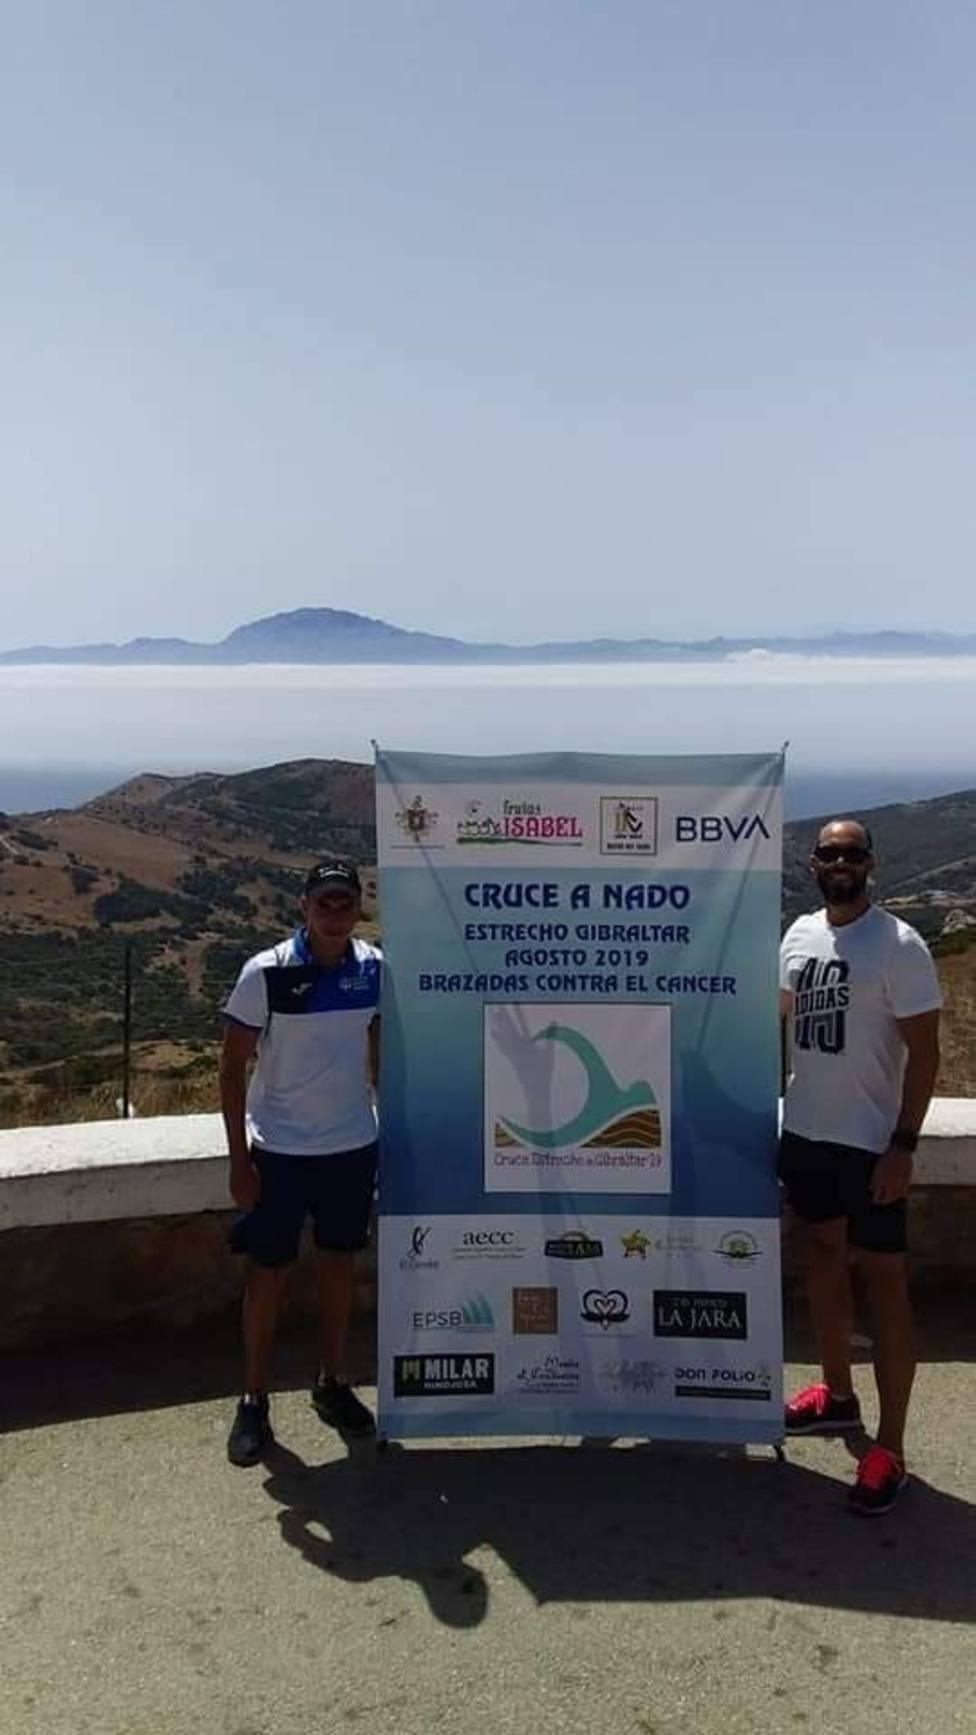 ctv-rsa-cruce-estrecho-gibraltar-10